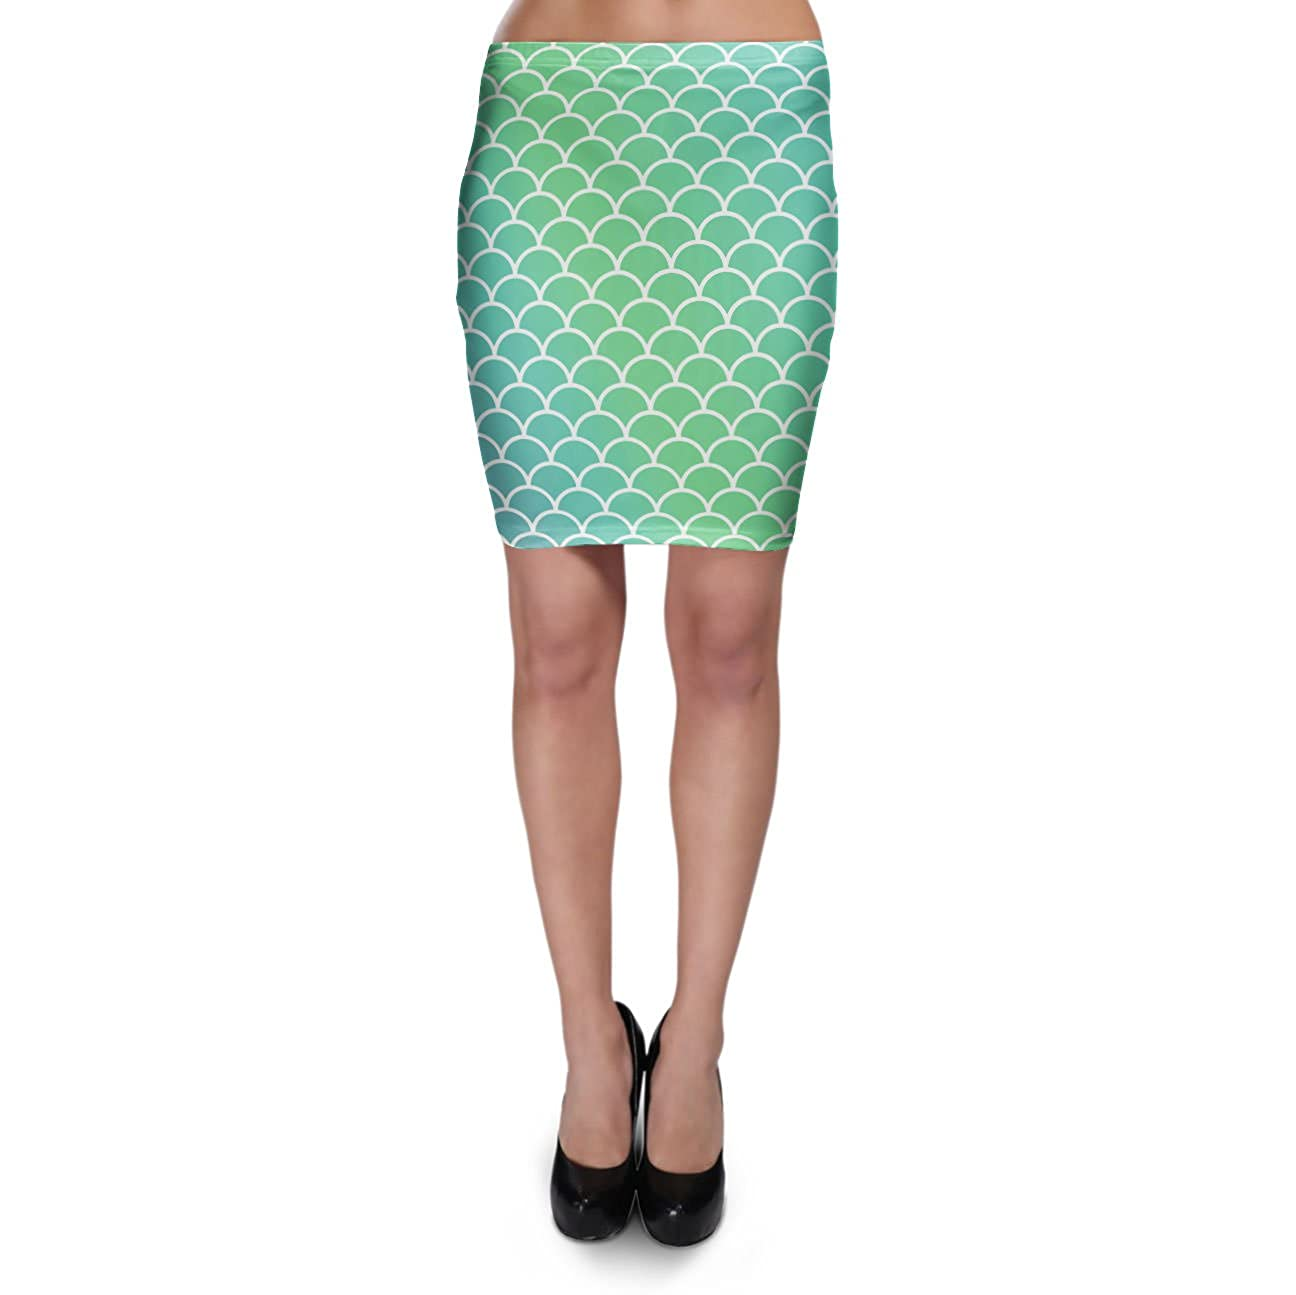 Mermaid Tail Bodycon Skirt XS-3XL Stretch Short Skirt